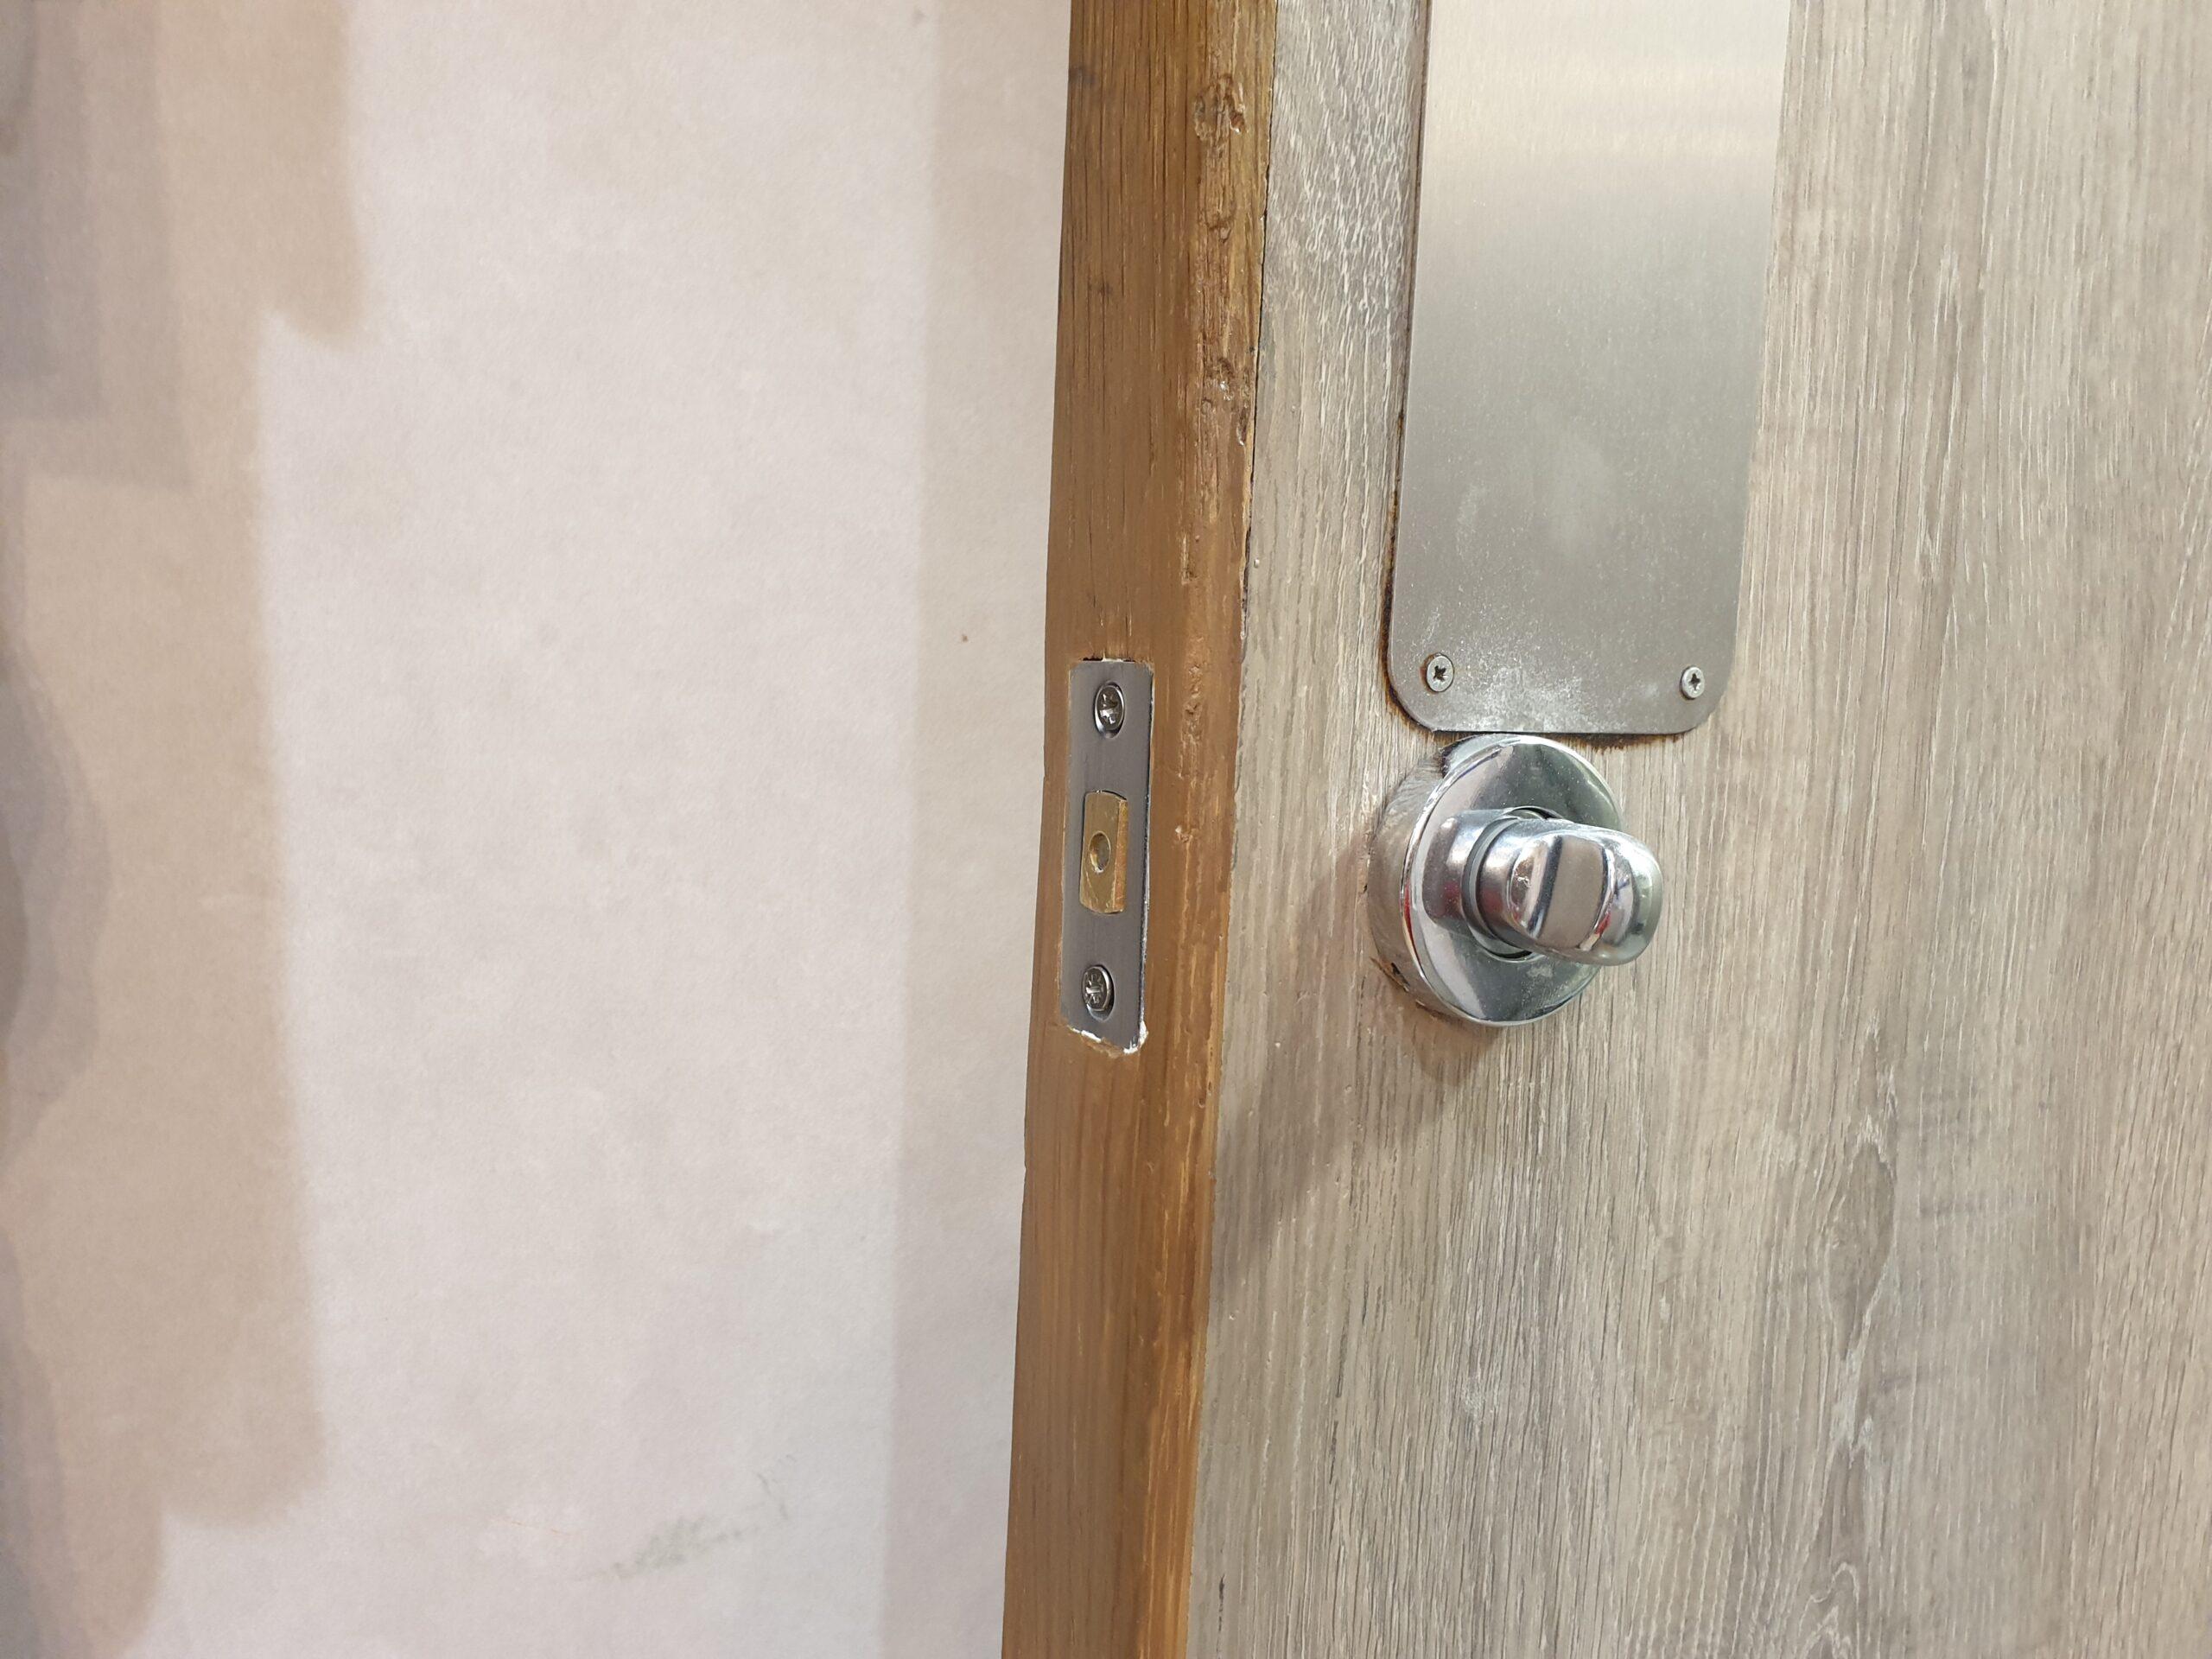 RESTURANT LAMINATE DOOR CHIP SCRATCH DENT REPAIR NAMCO REFURBS AFTER